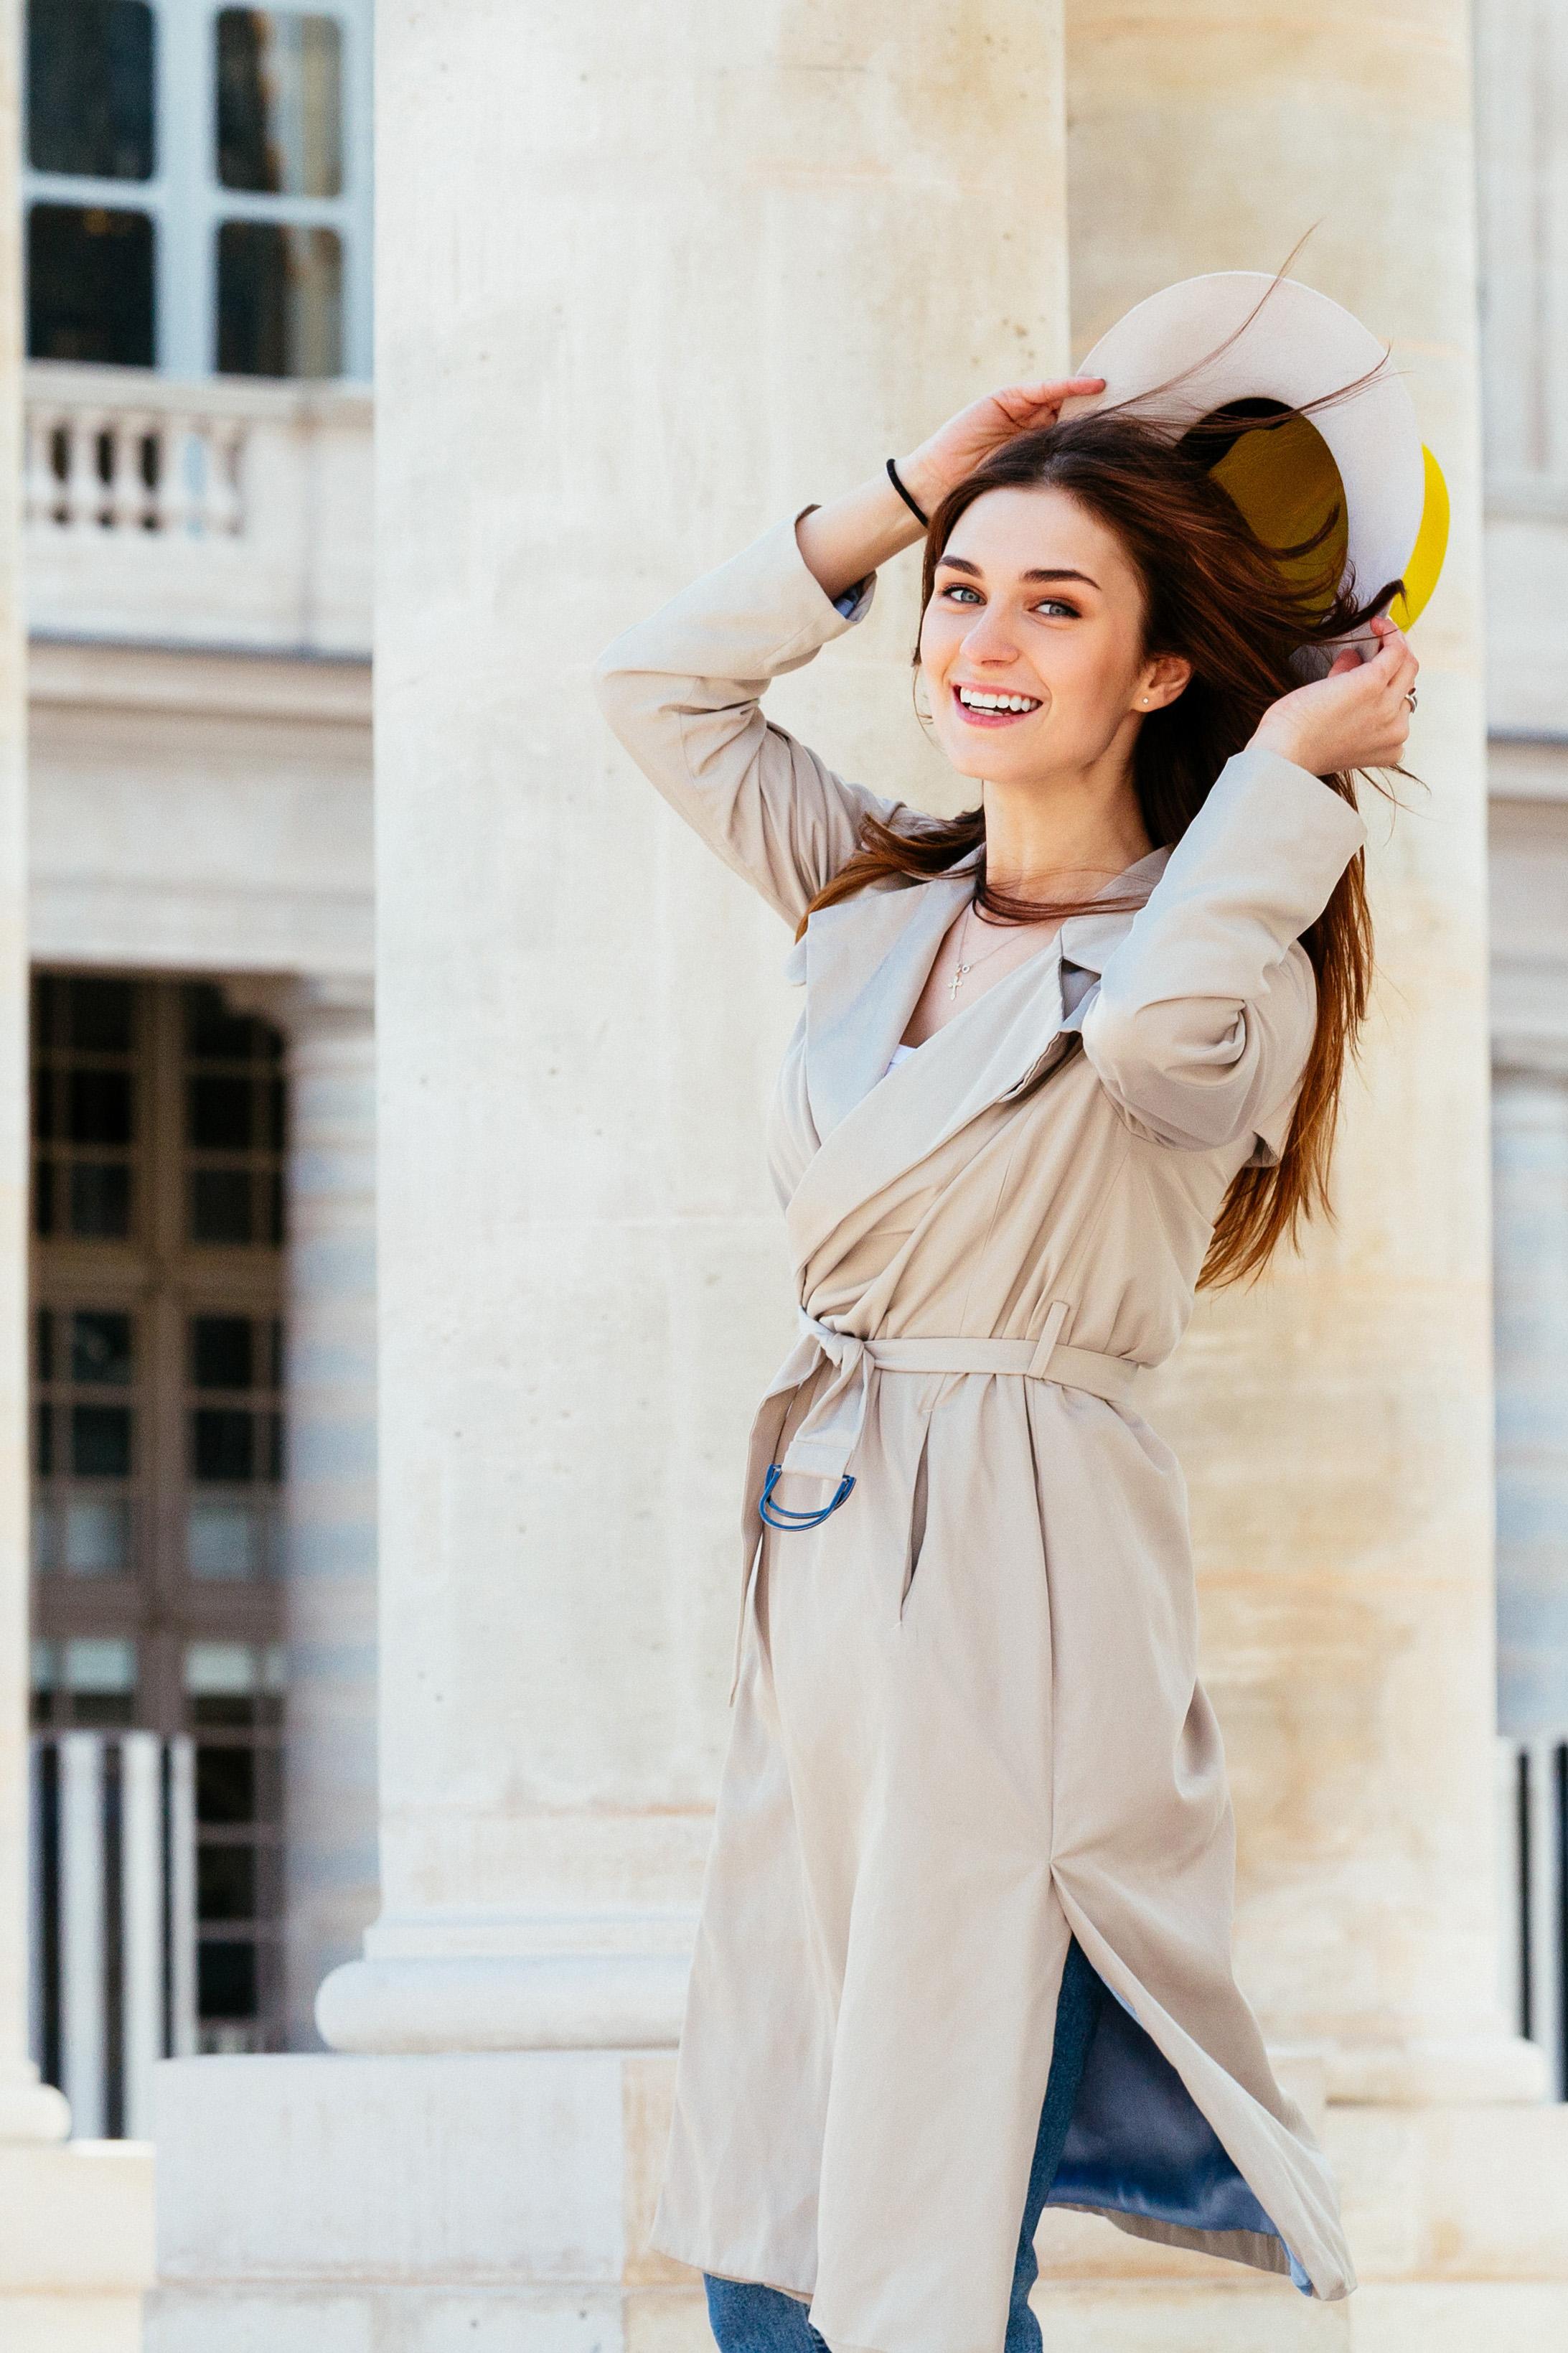 Paris Photographer Palais Royal Brand Lookbook fashion brand Iheartparisfr